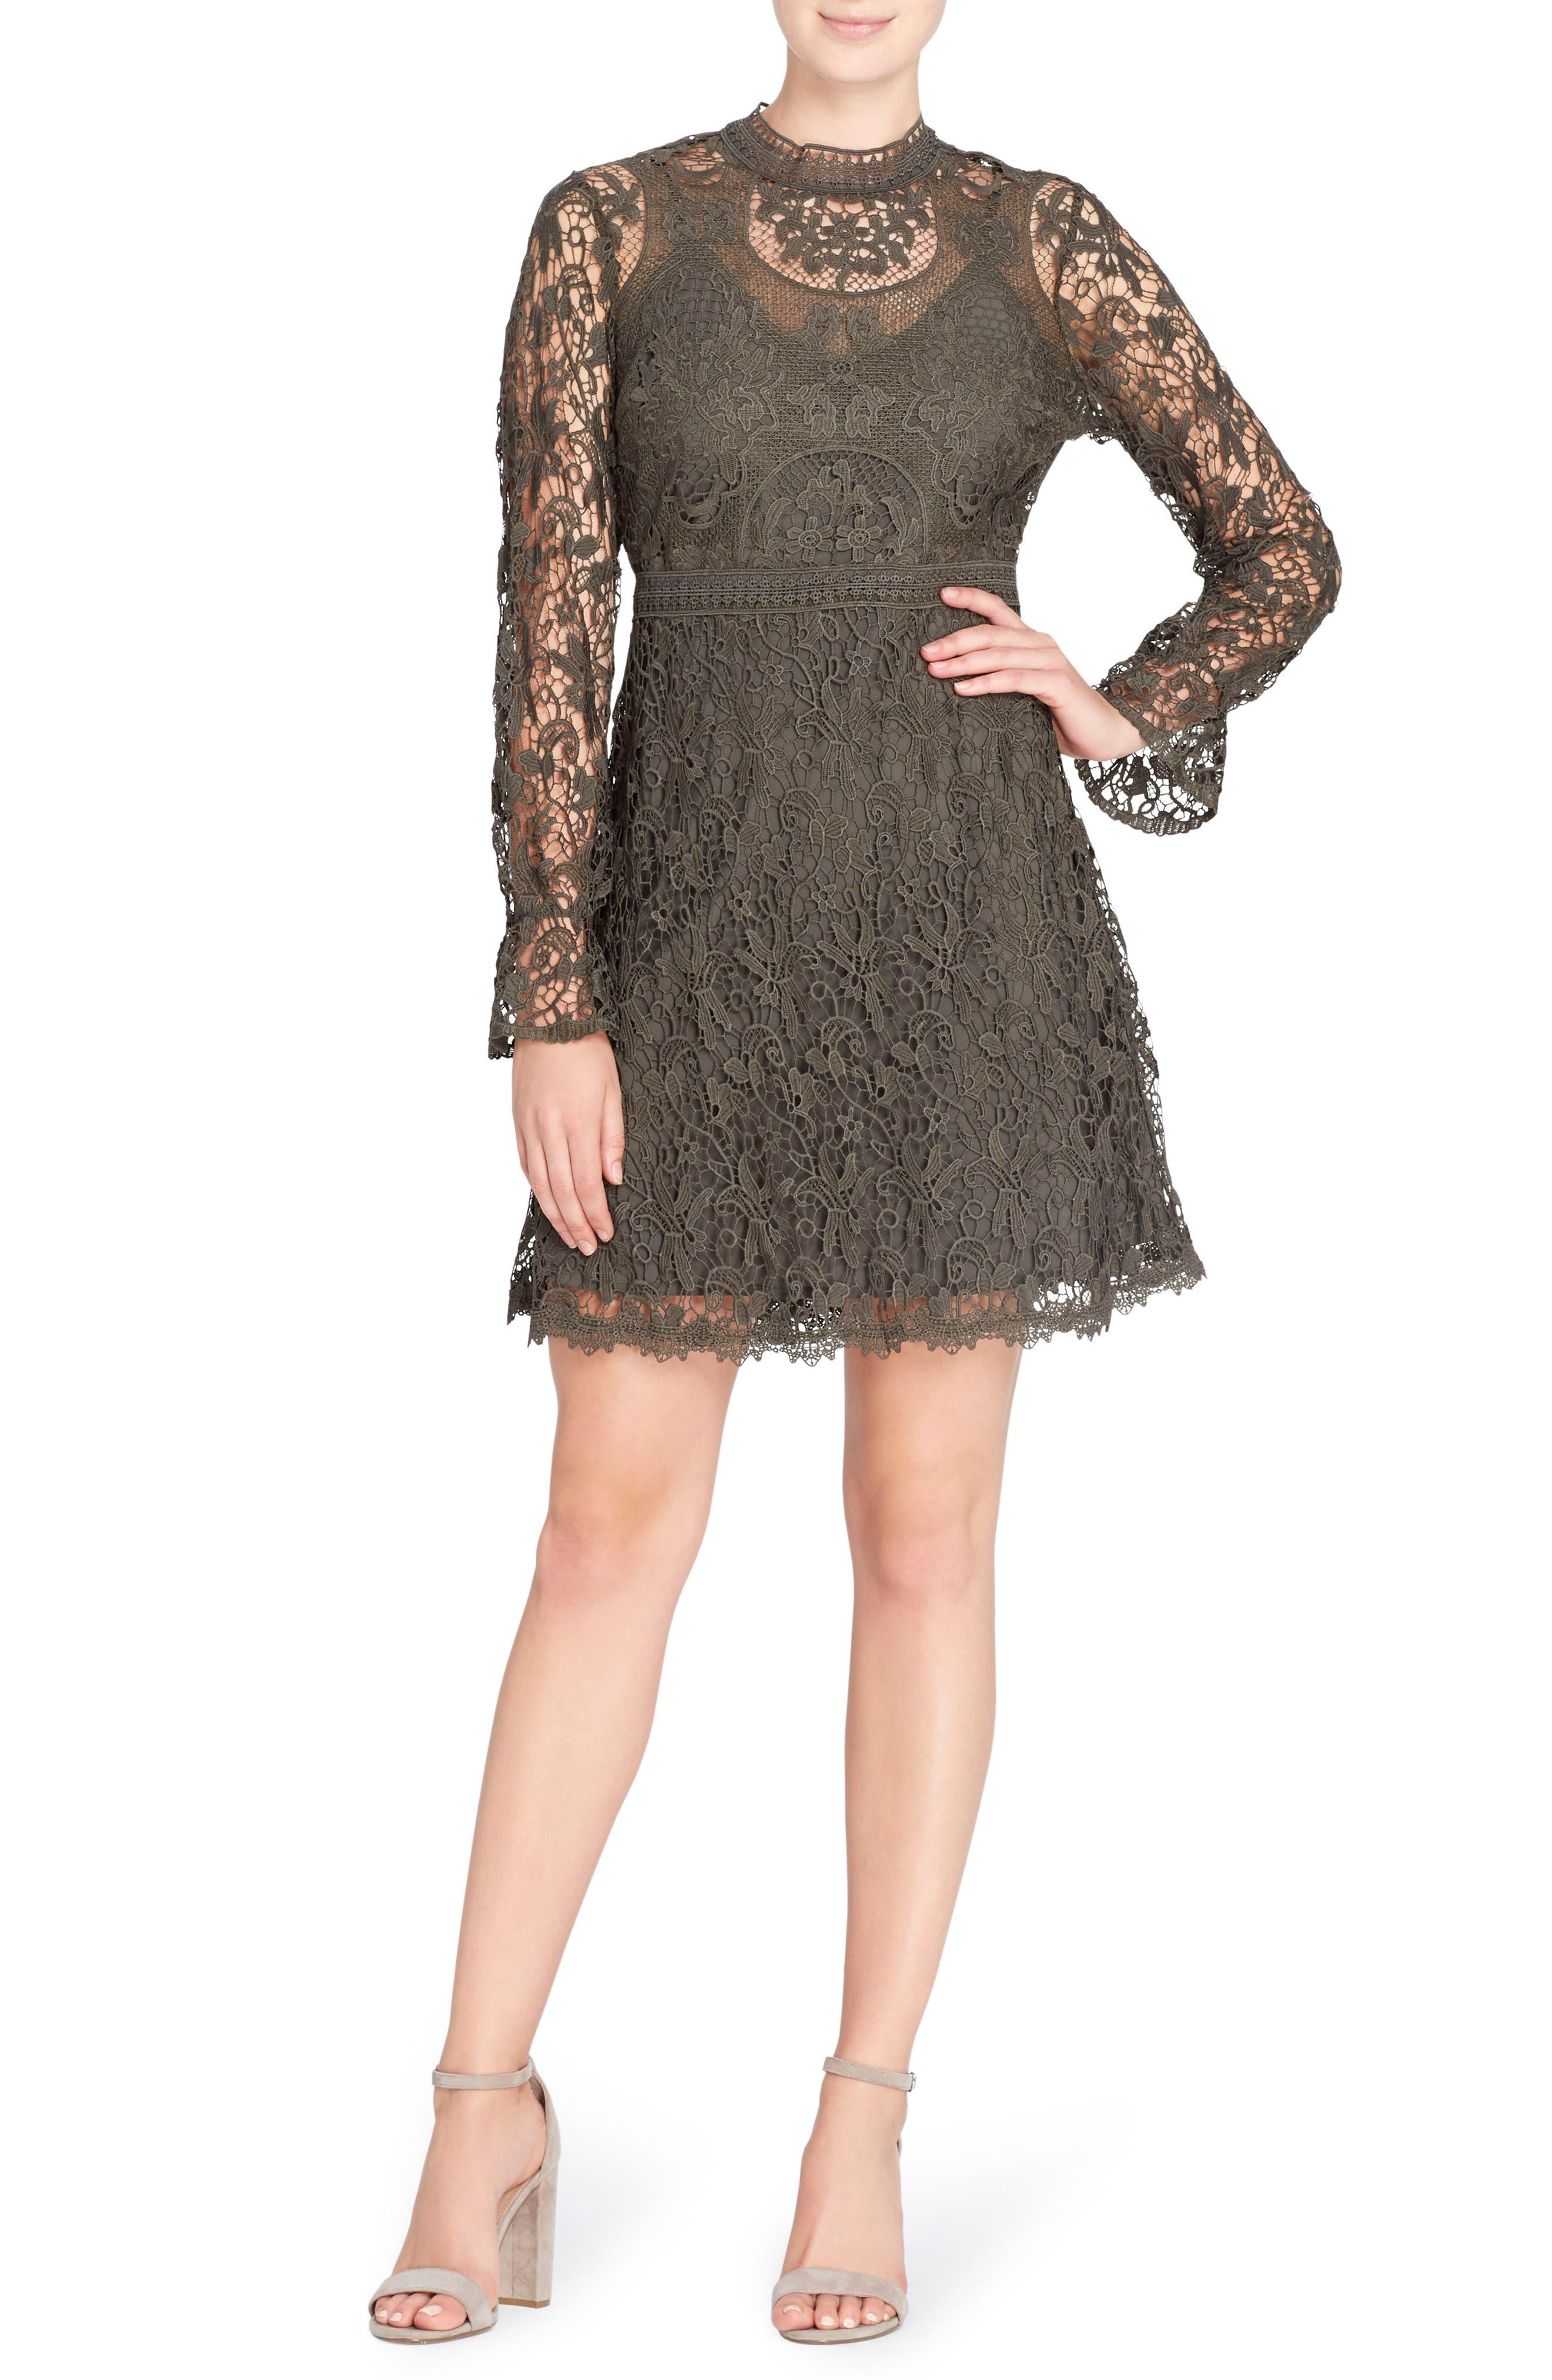 Main Image - Catherine Catherine Malandrino Miia Lace Fit & Flare Dress